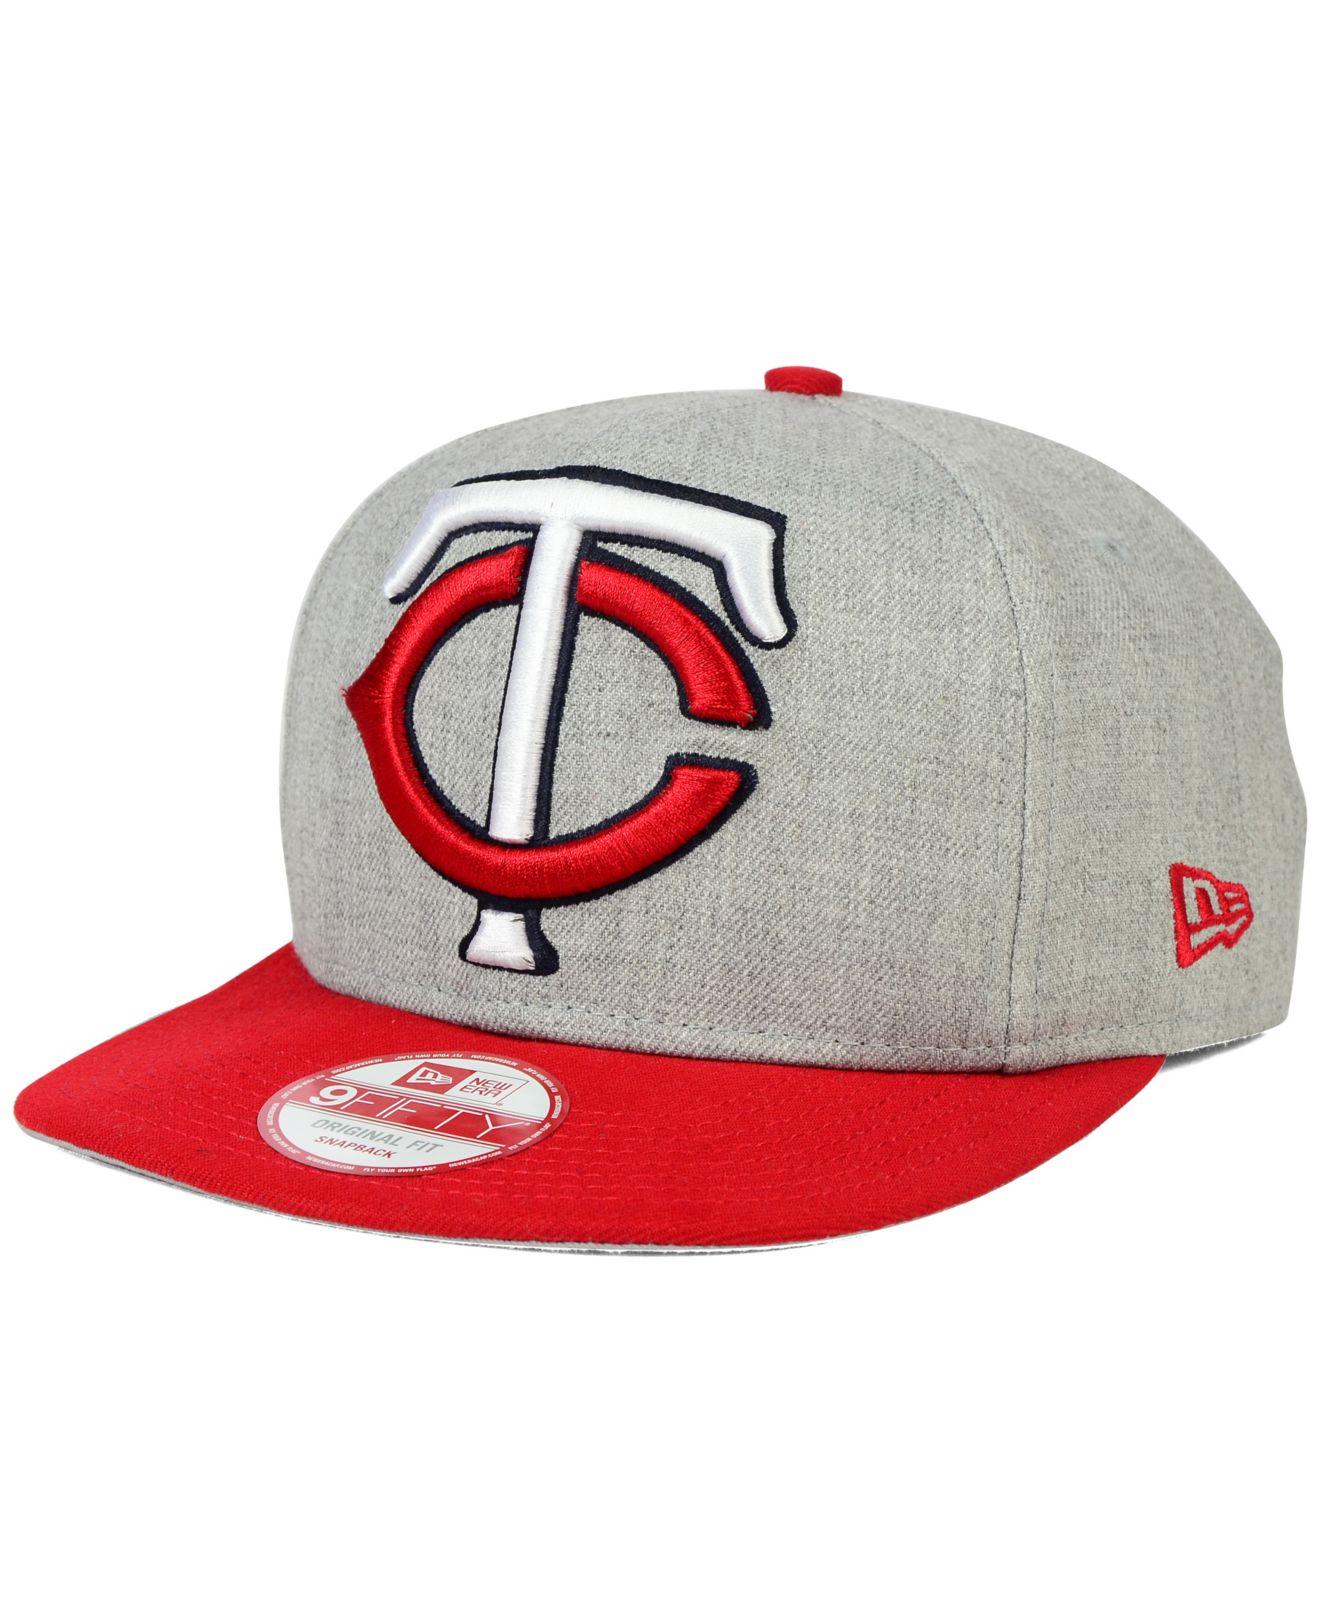 reputable site c2757 b6a0d Lyst - KTZ Minnesota Twins Logo Grand 9fifty Snapback Cap in Gray ...